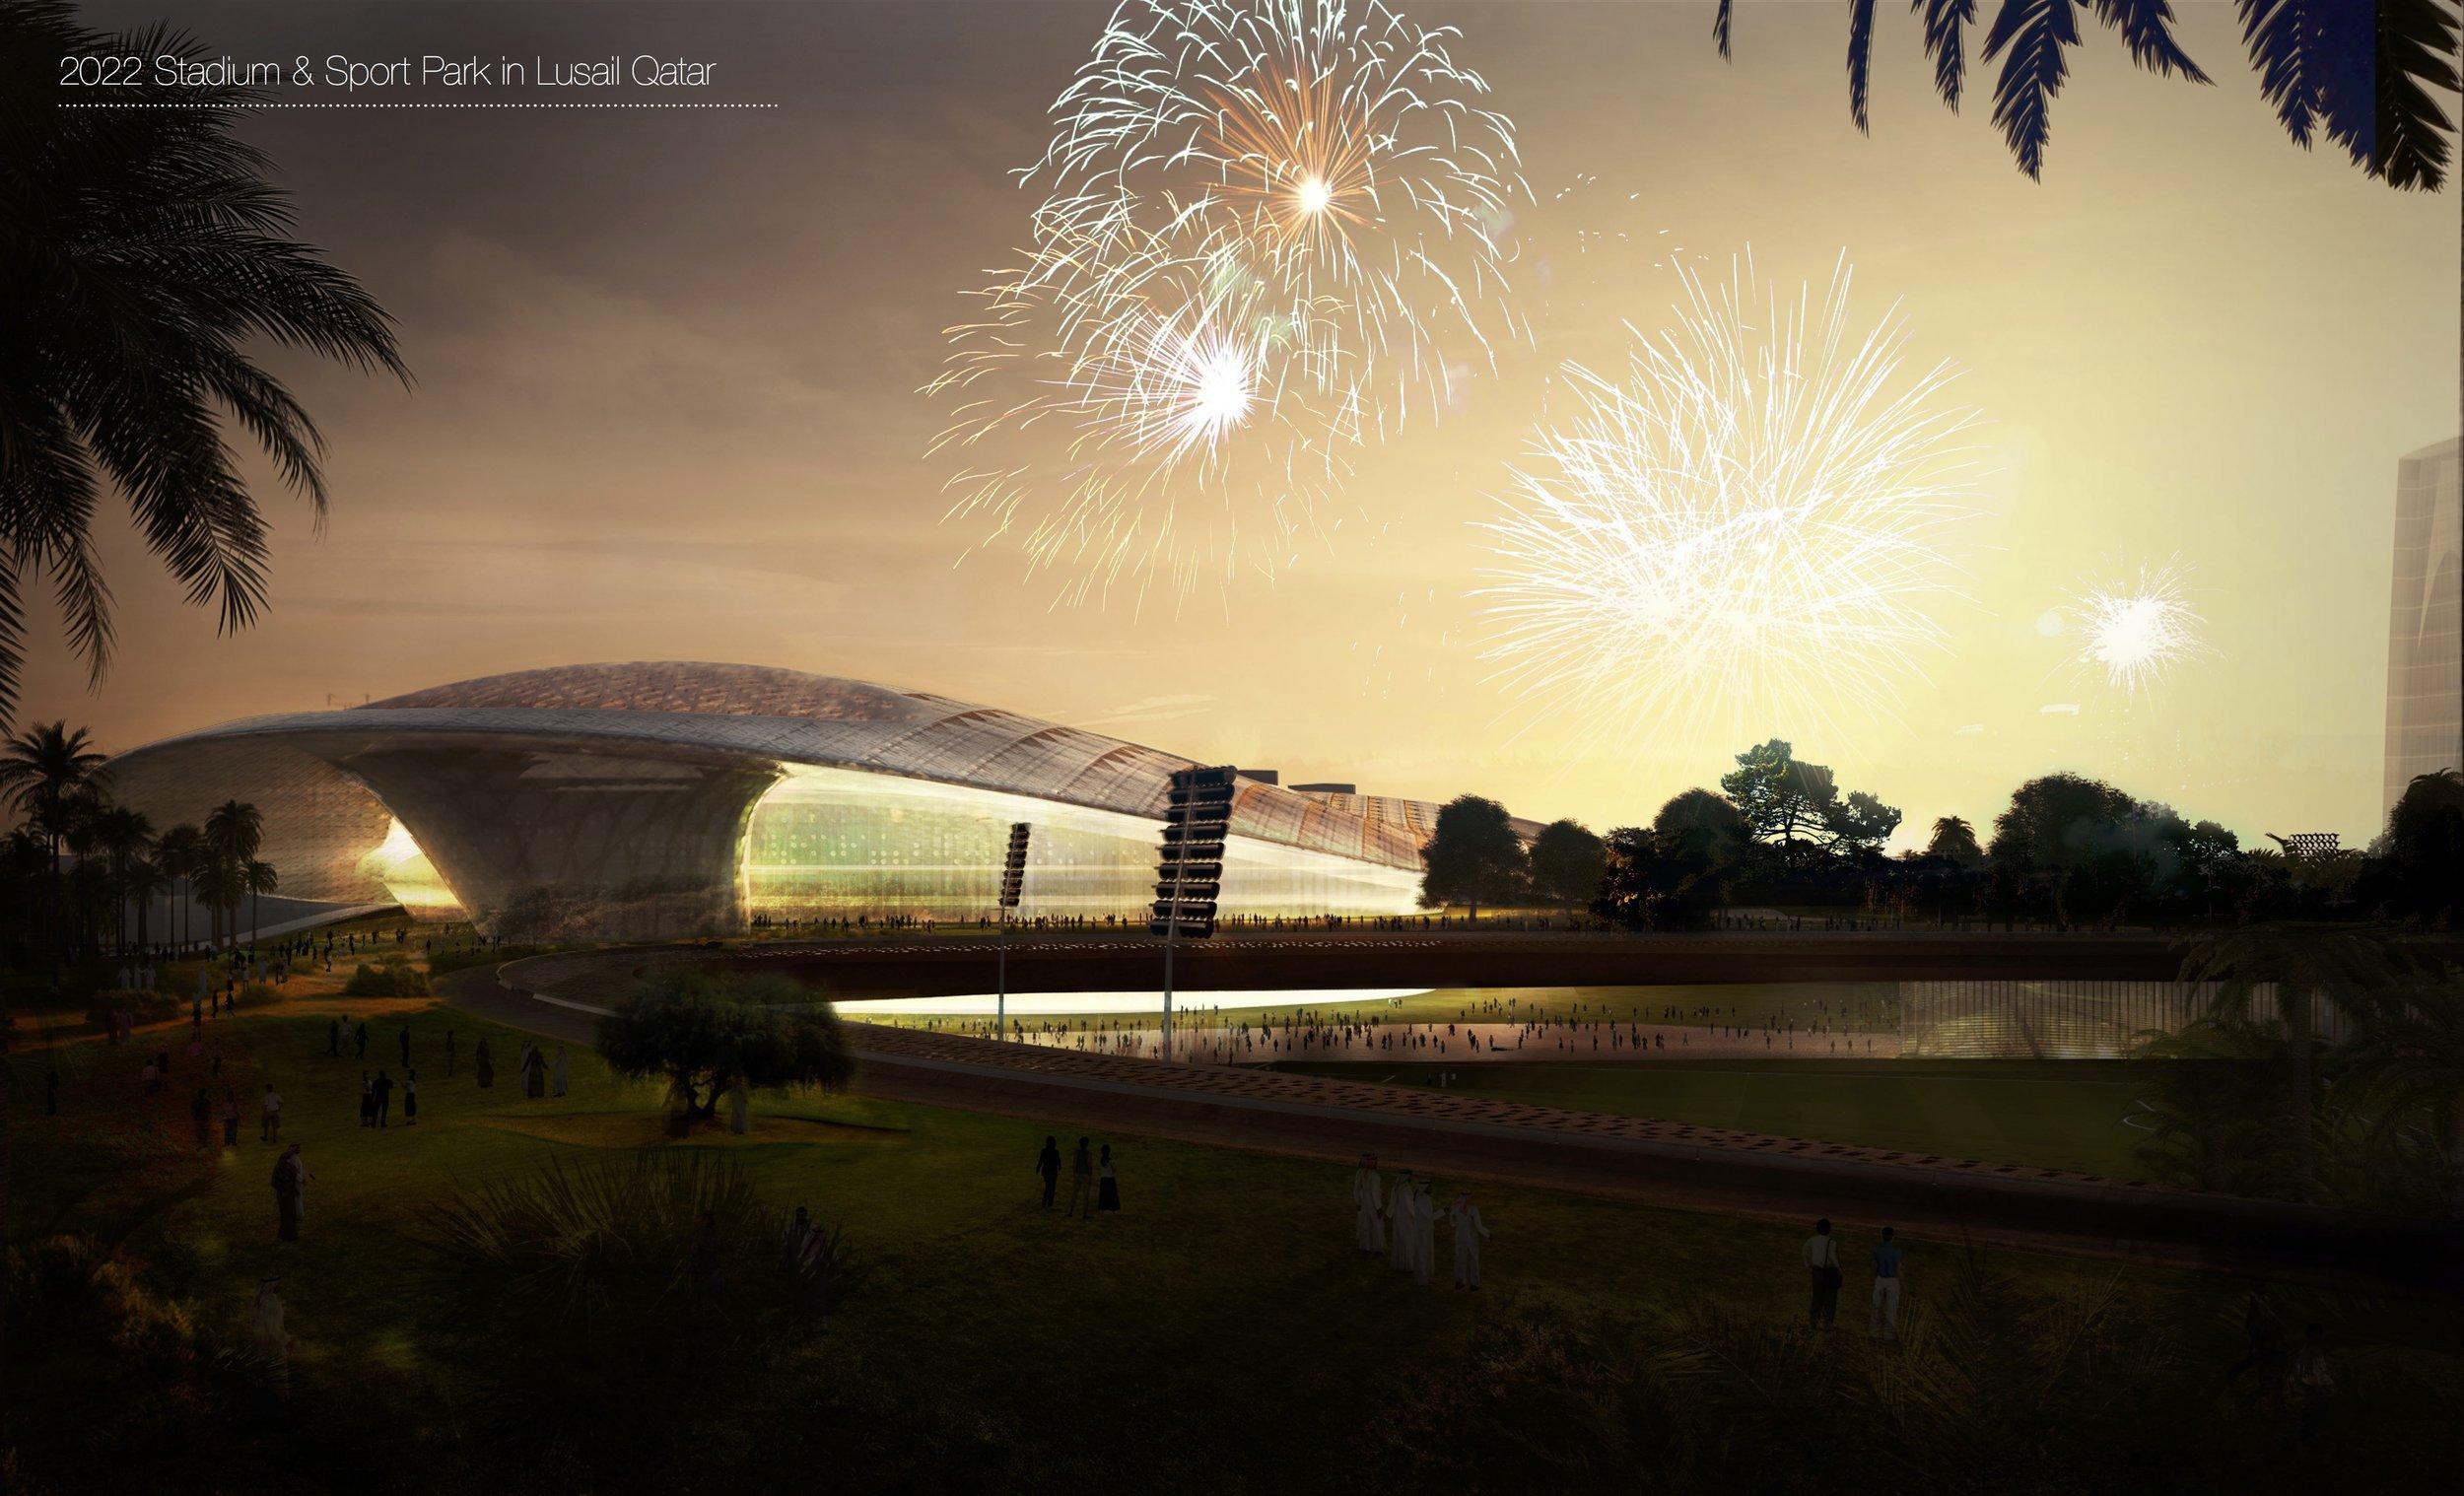 130730 Qatar_Main_Stadium_Concept_RUF 20.jpg